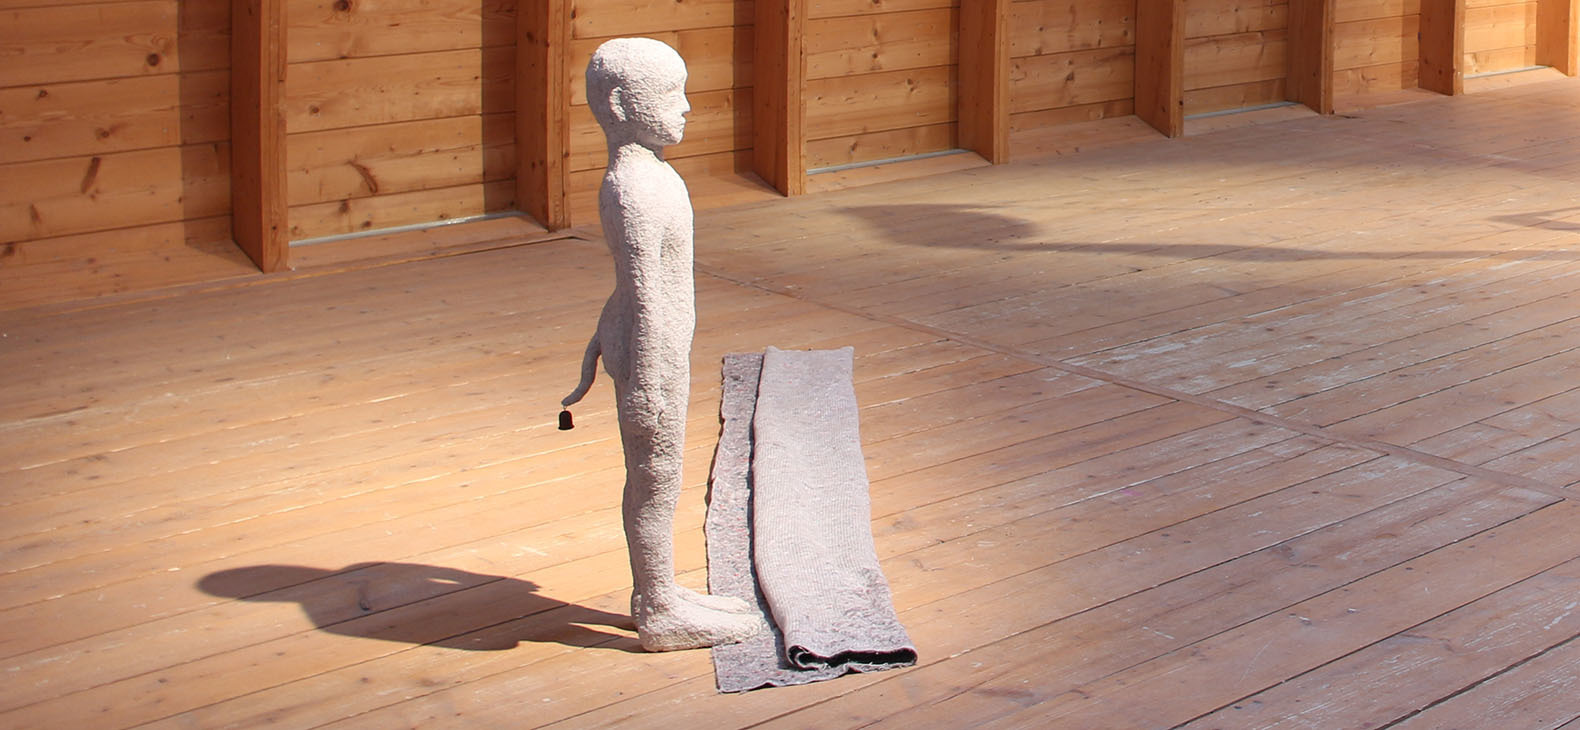 Natalia Janus-Malewska: Herd Boy, 2017, sculpture, 120x50x200 cm, part of the exhibition Interplay 2017 in the framework of Transfer > Oronsko